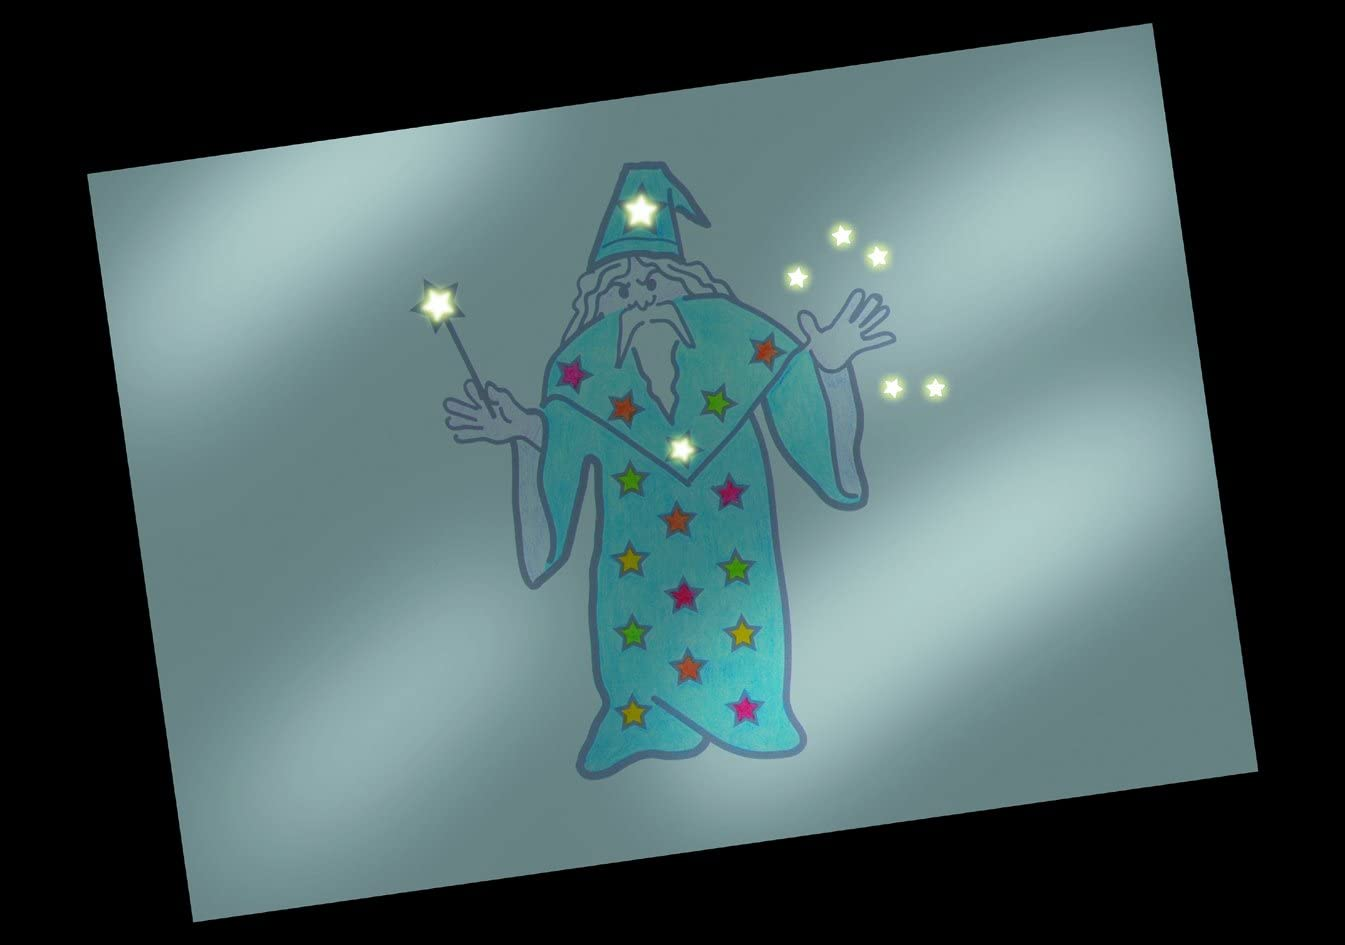 Original Glowstars glow in the dark marker 4